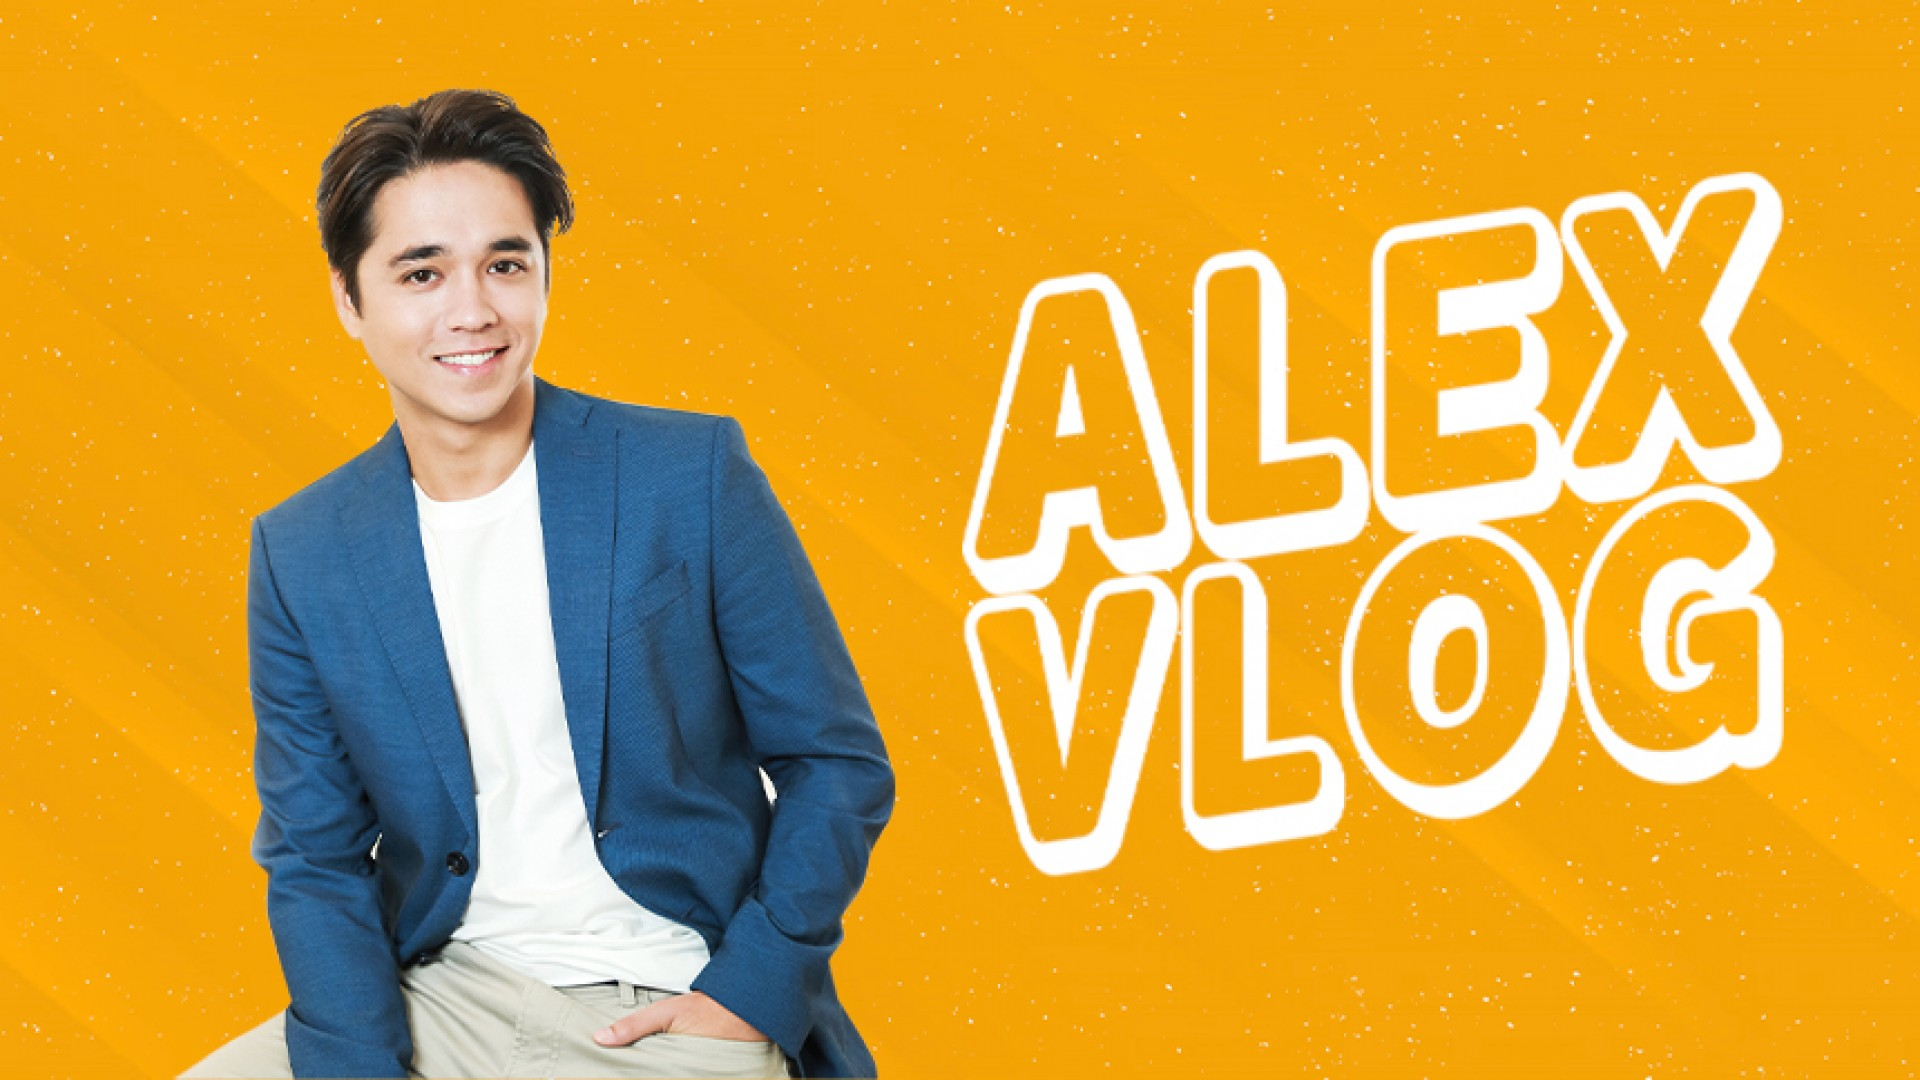 Alex Vlog